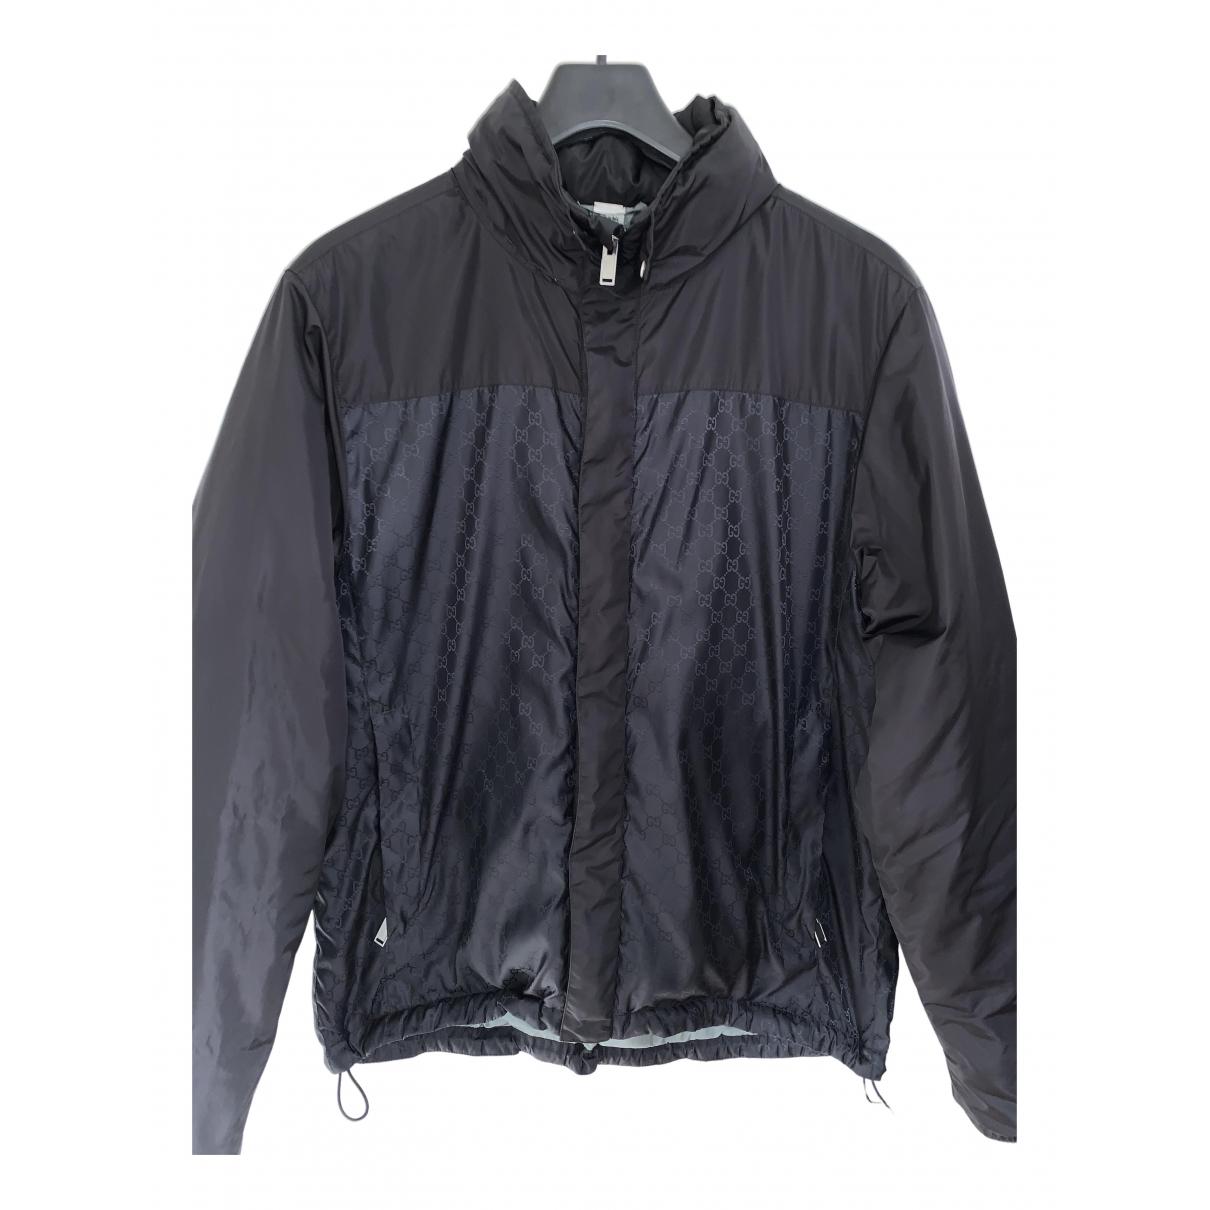 Gucci \N Jacke in  Schwarz Polyester